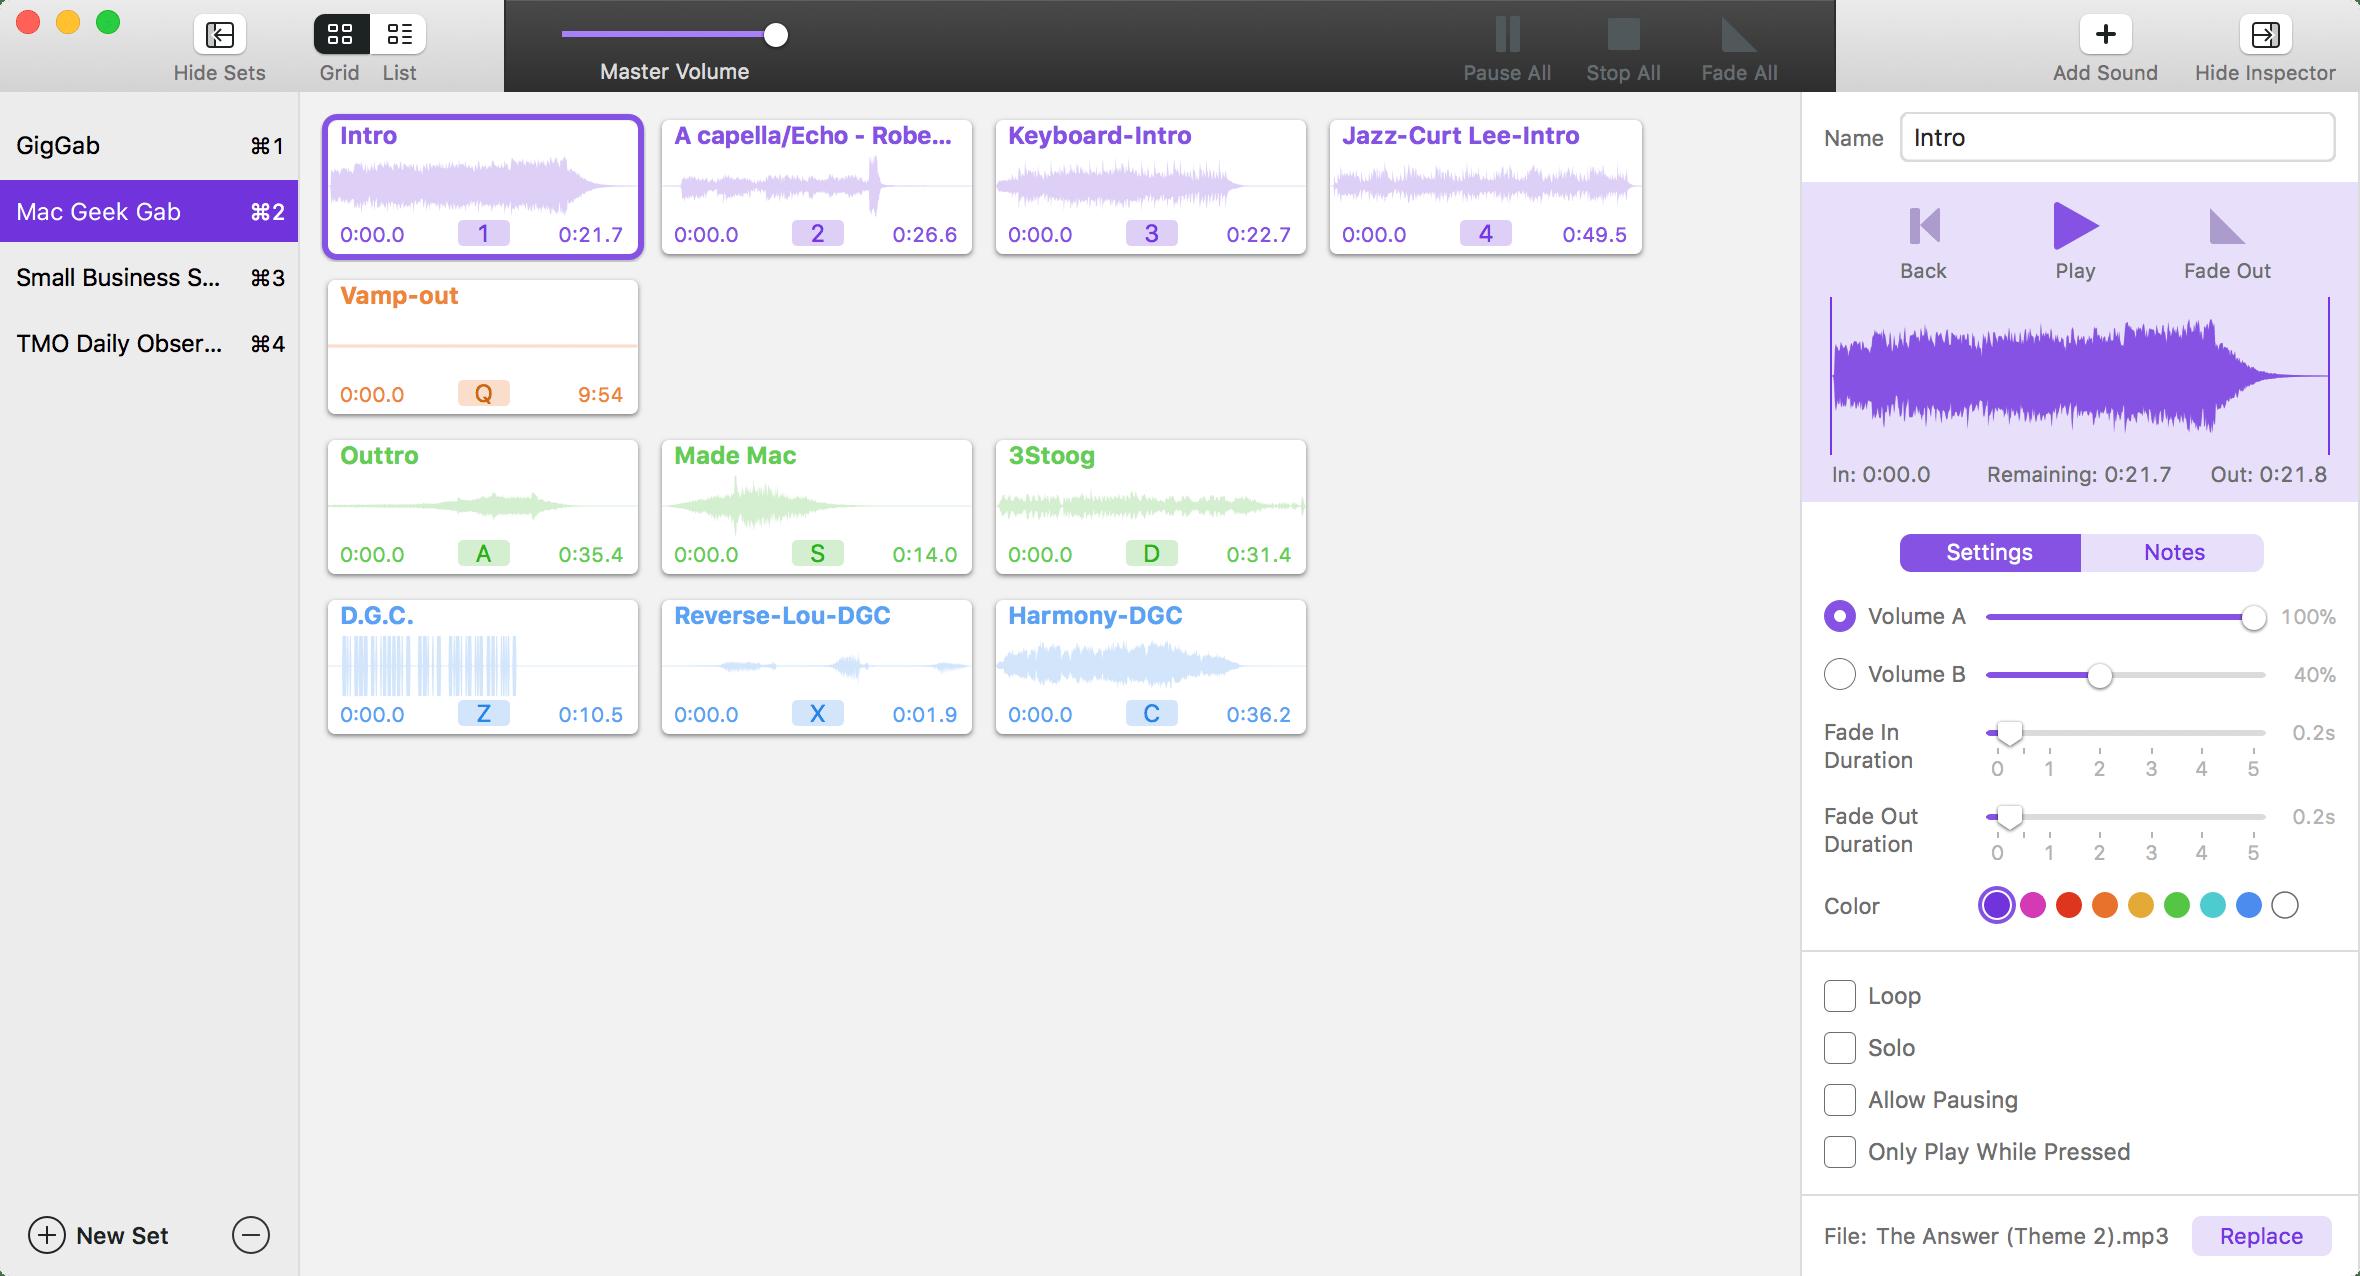 Farrago screenshot with Mac Geek Gab set showing